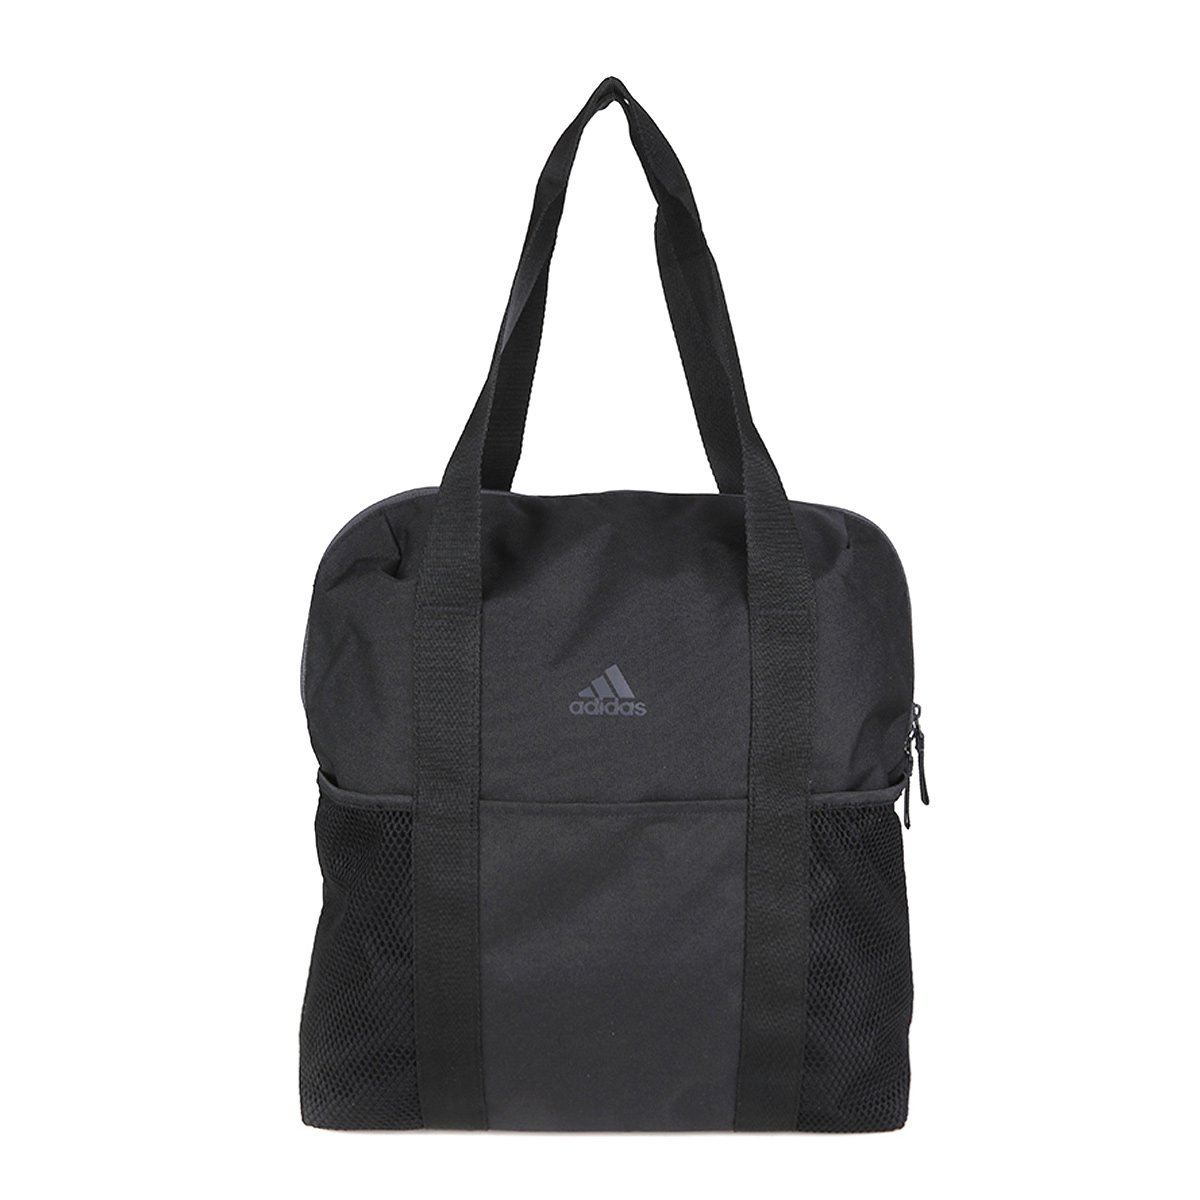 Bolsa Adidas Tote Core Feminina - Preto - Compre Agora  0d3847d27b8